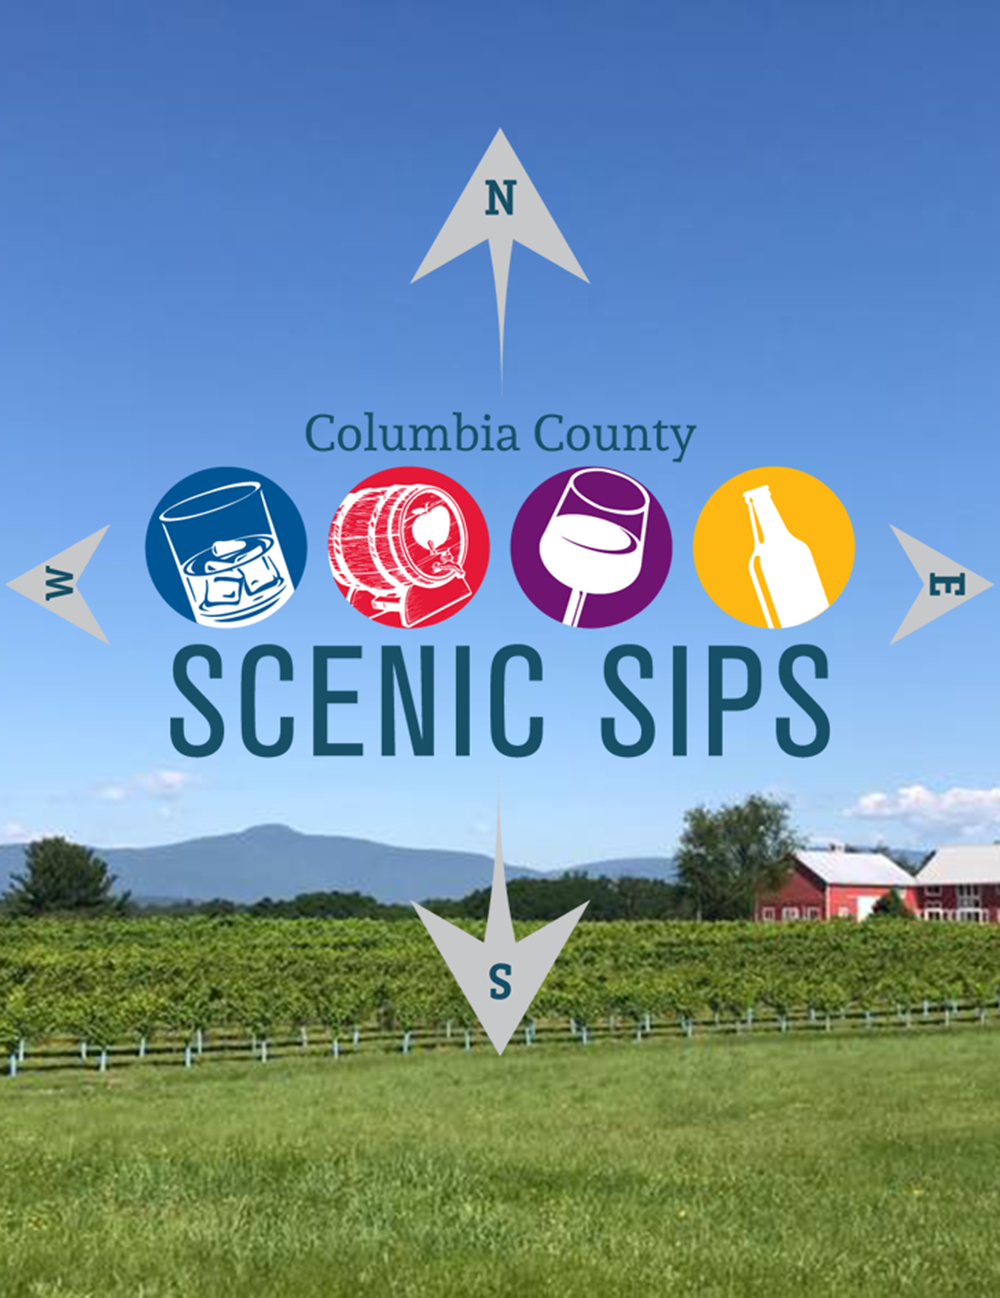 Columbia County Scenic Sips